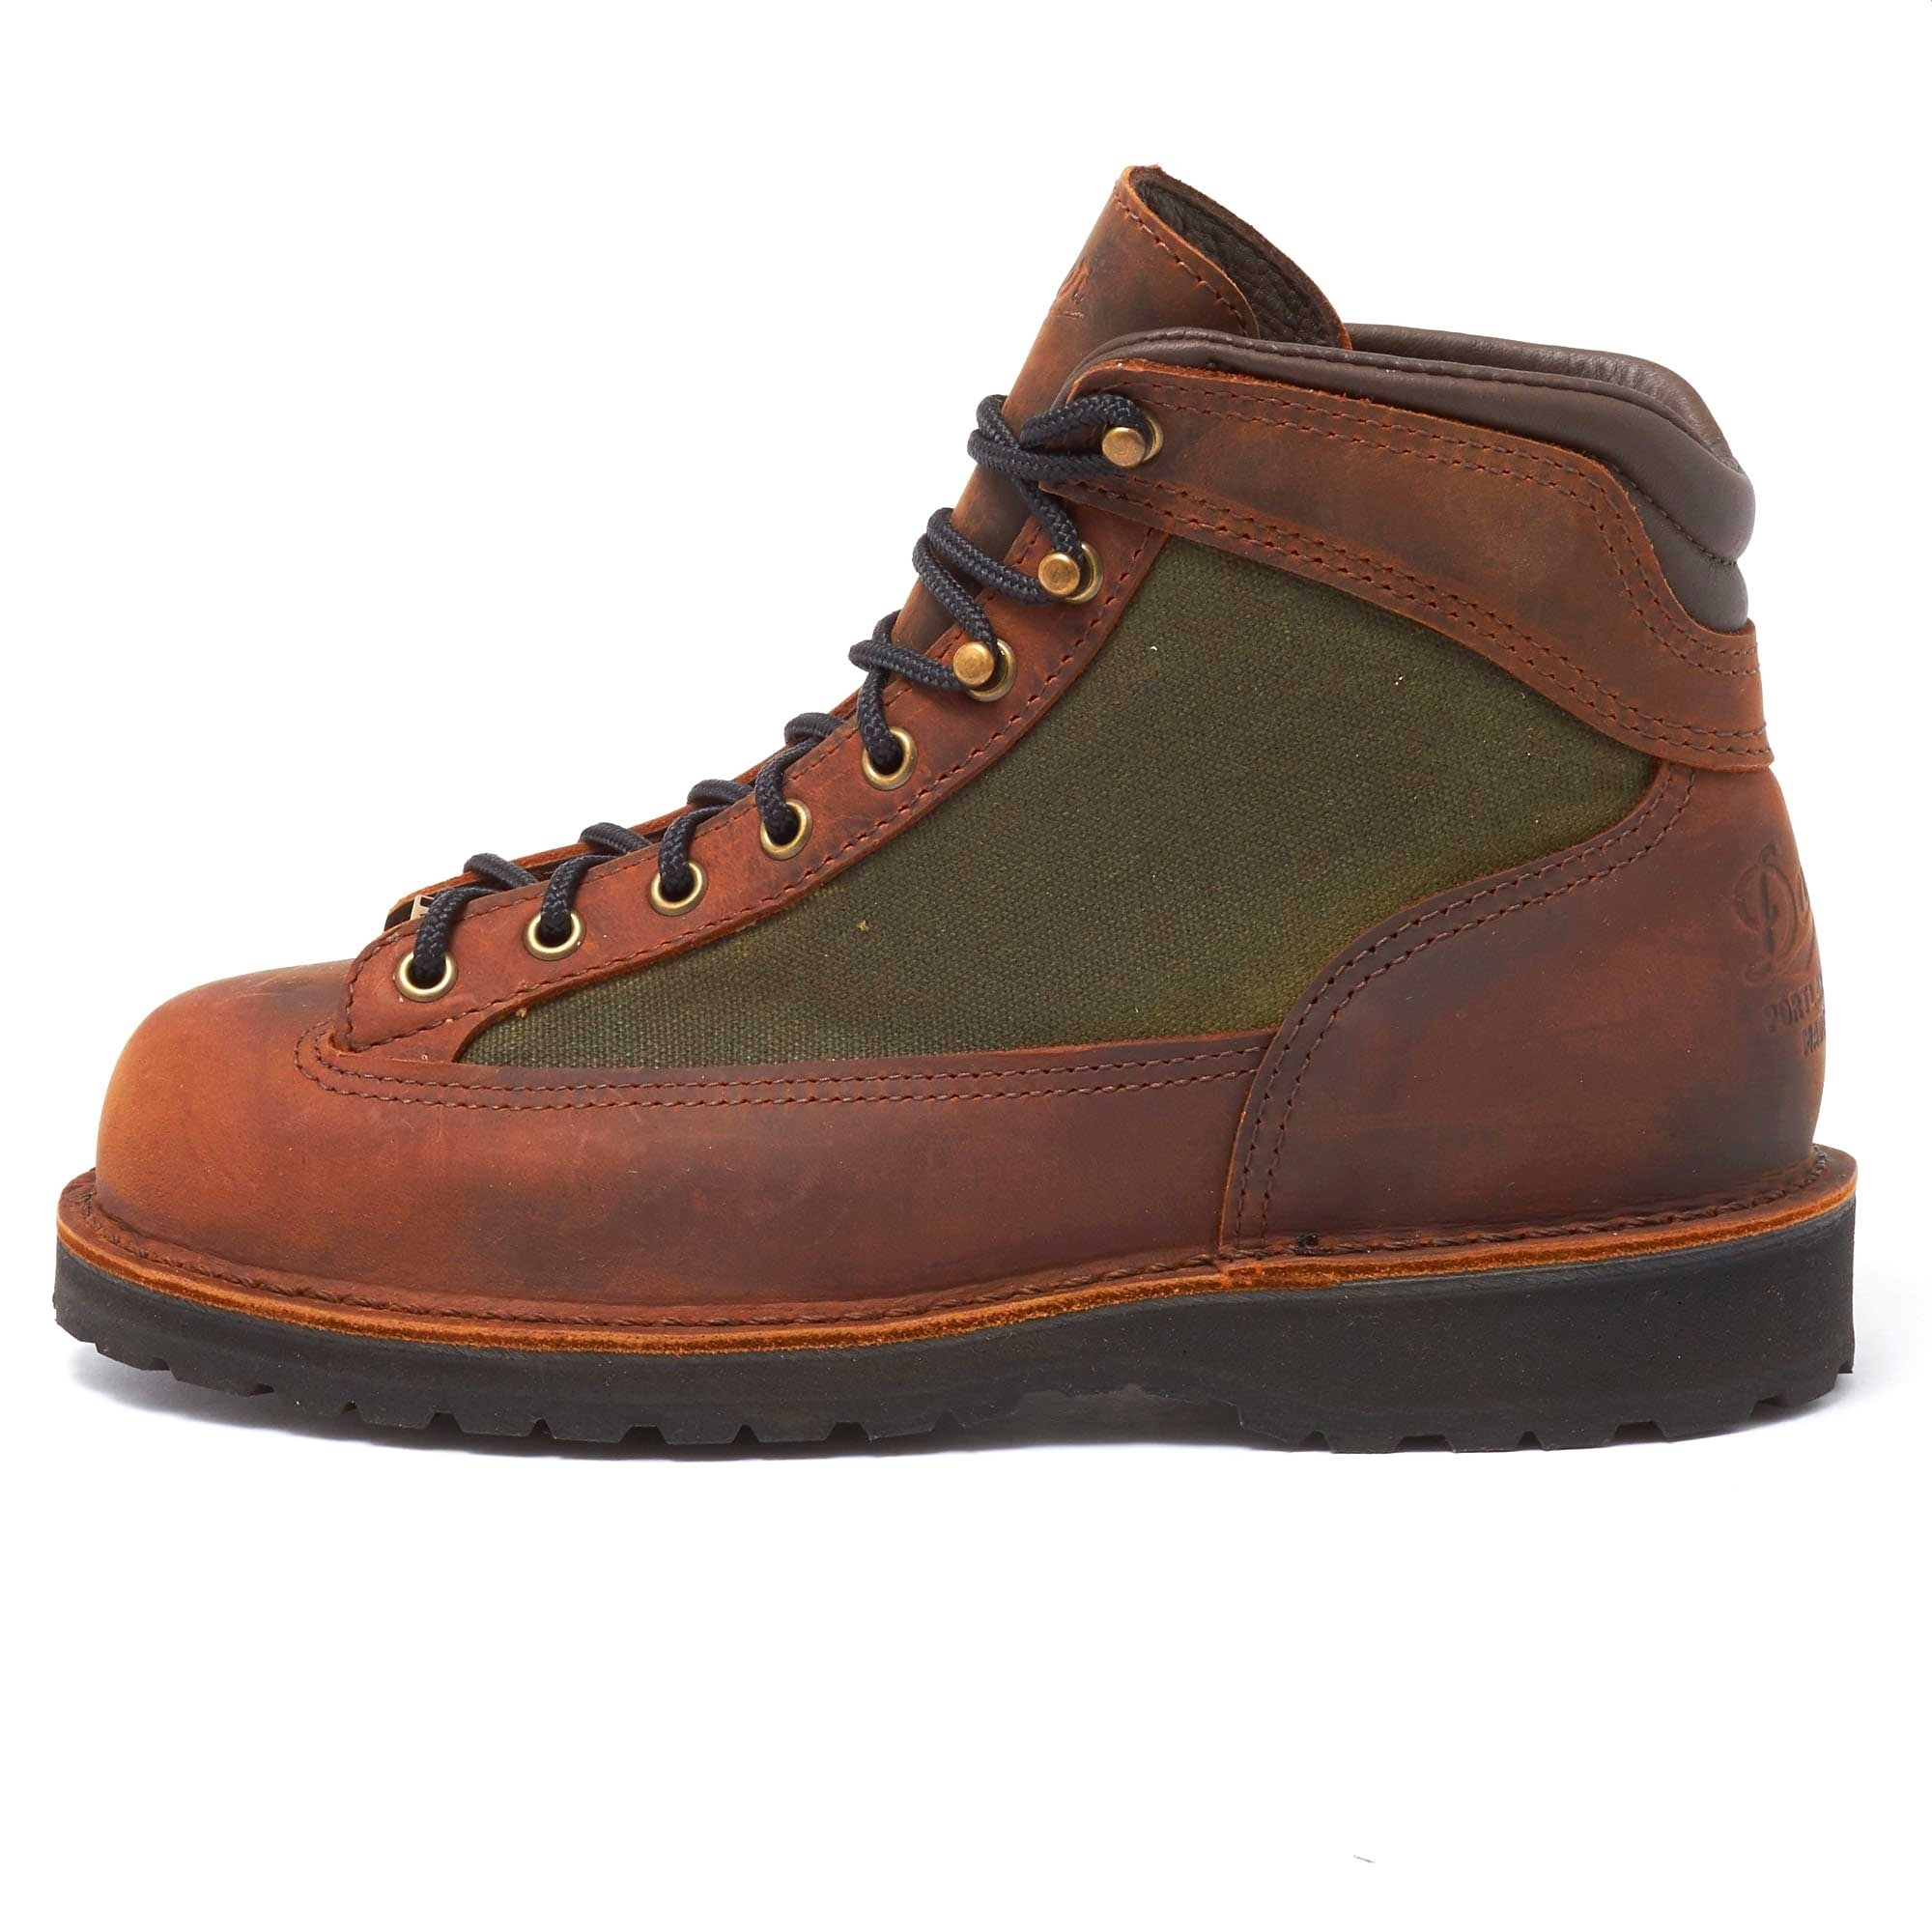 Danner Boots Ridge Hiking Boots   Dark